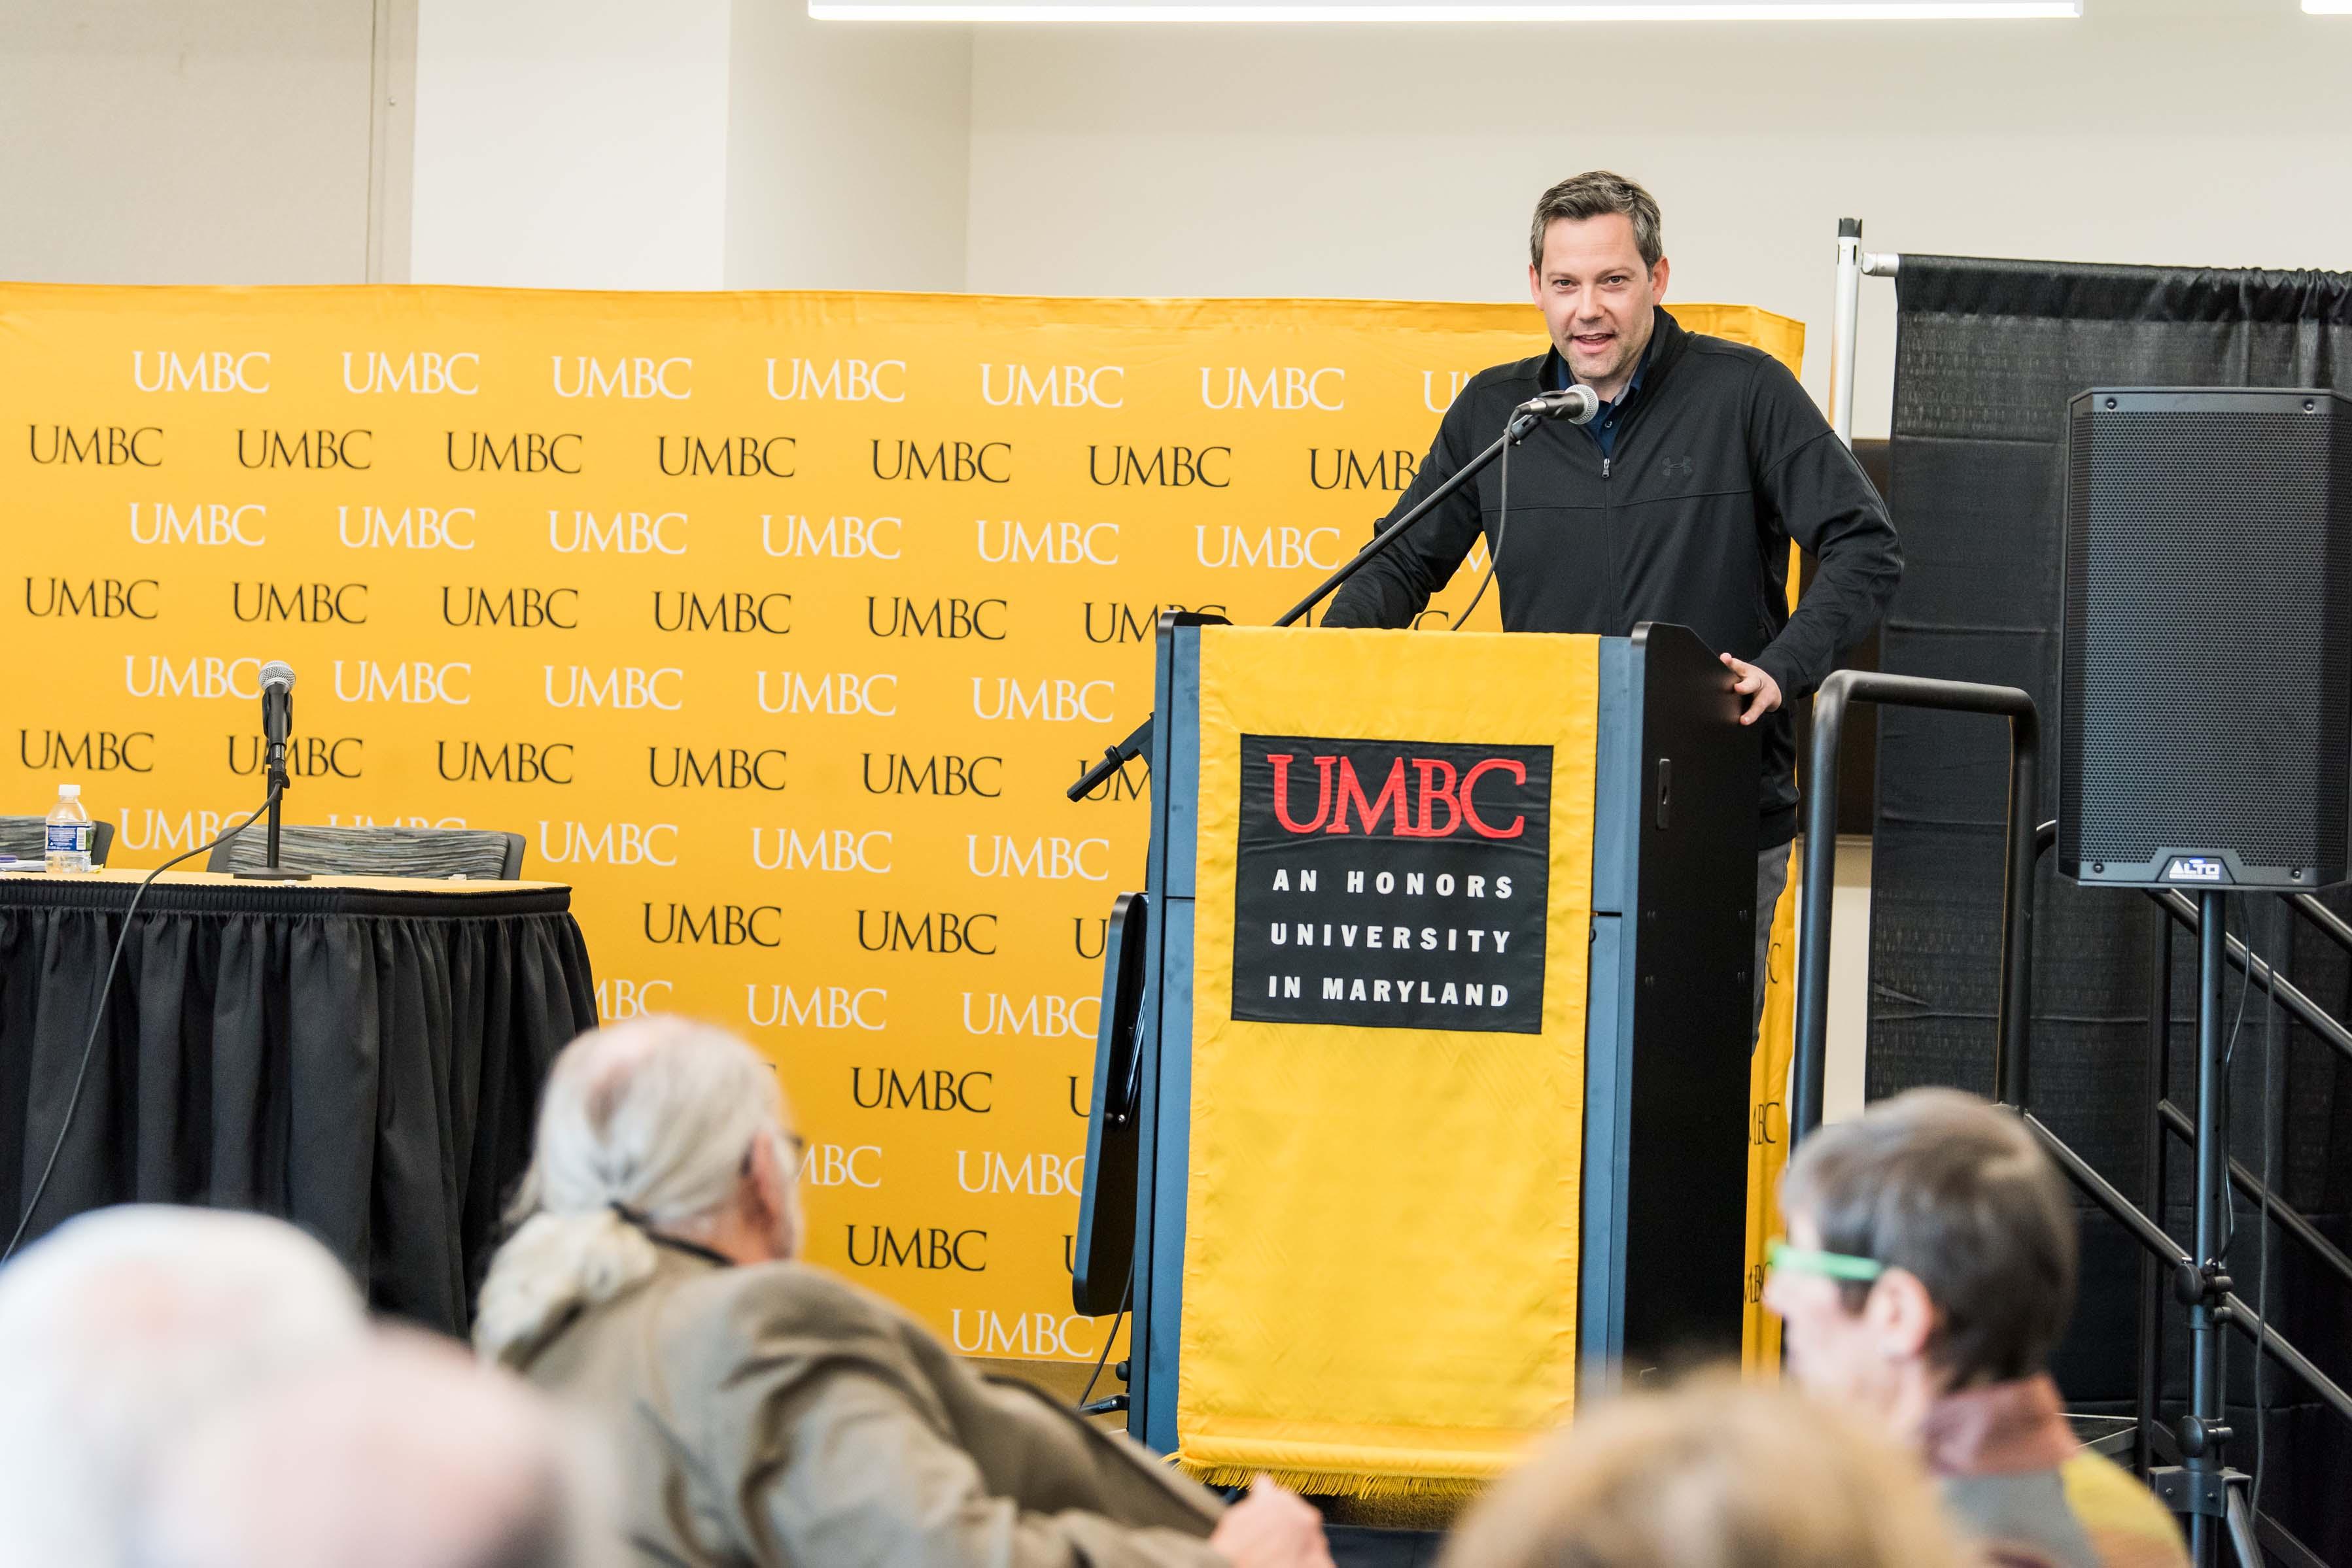 Basketball coach gives speech behind UMBC podium